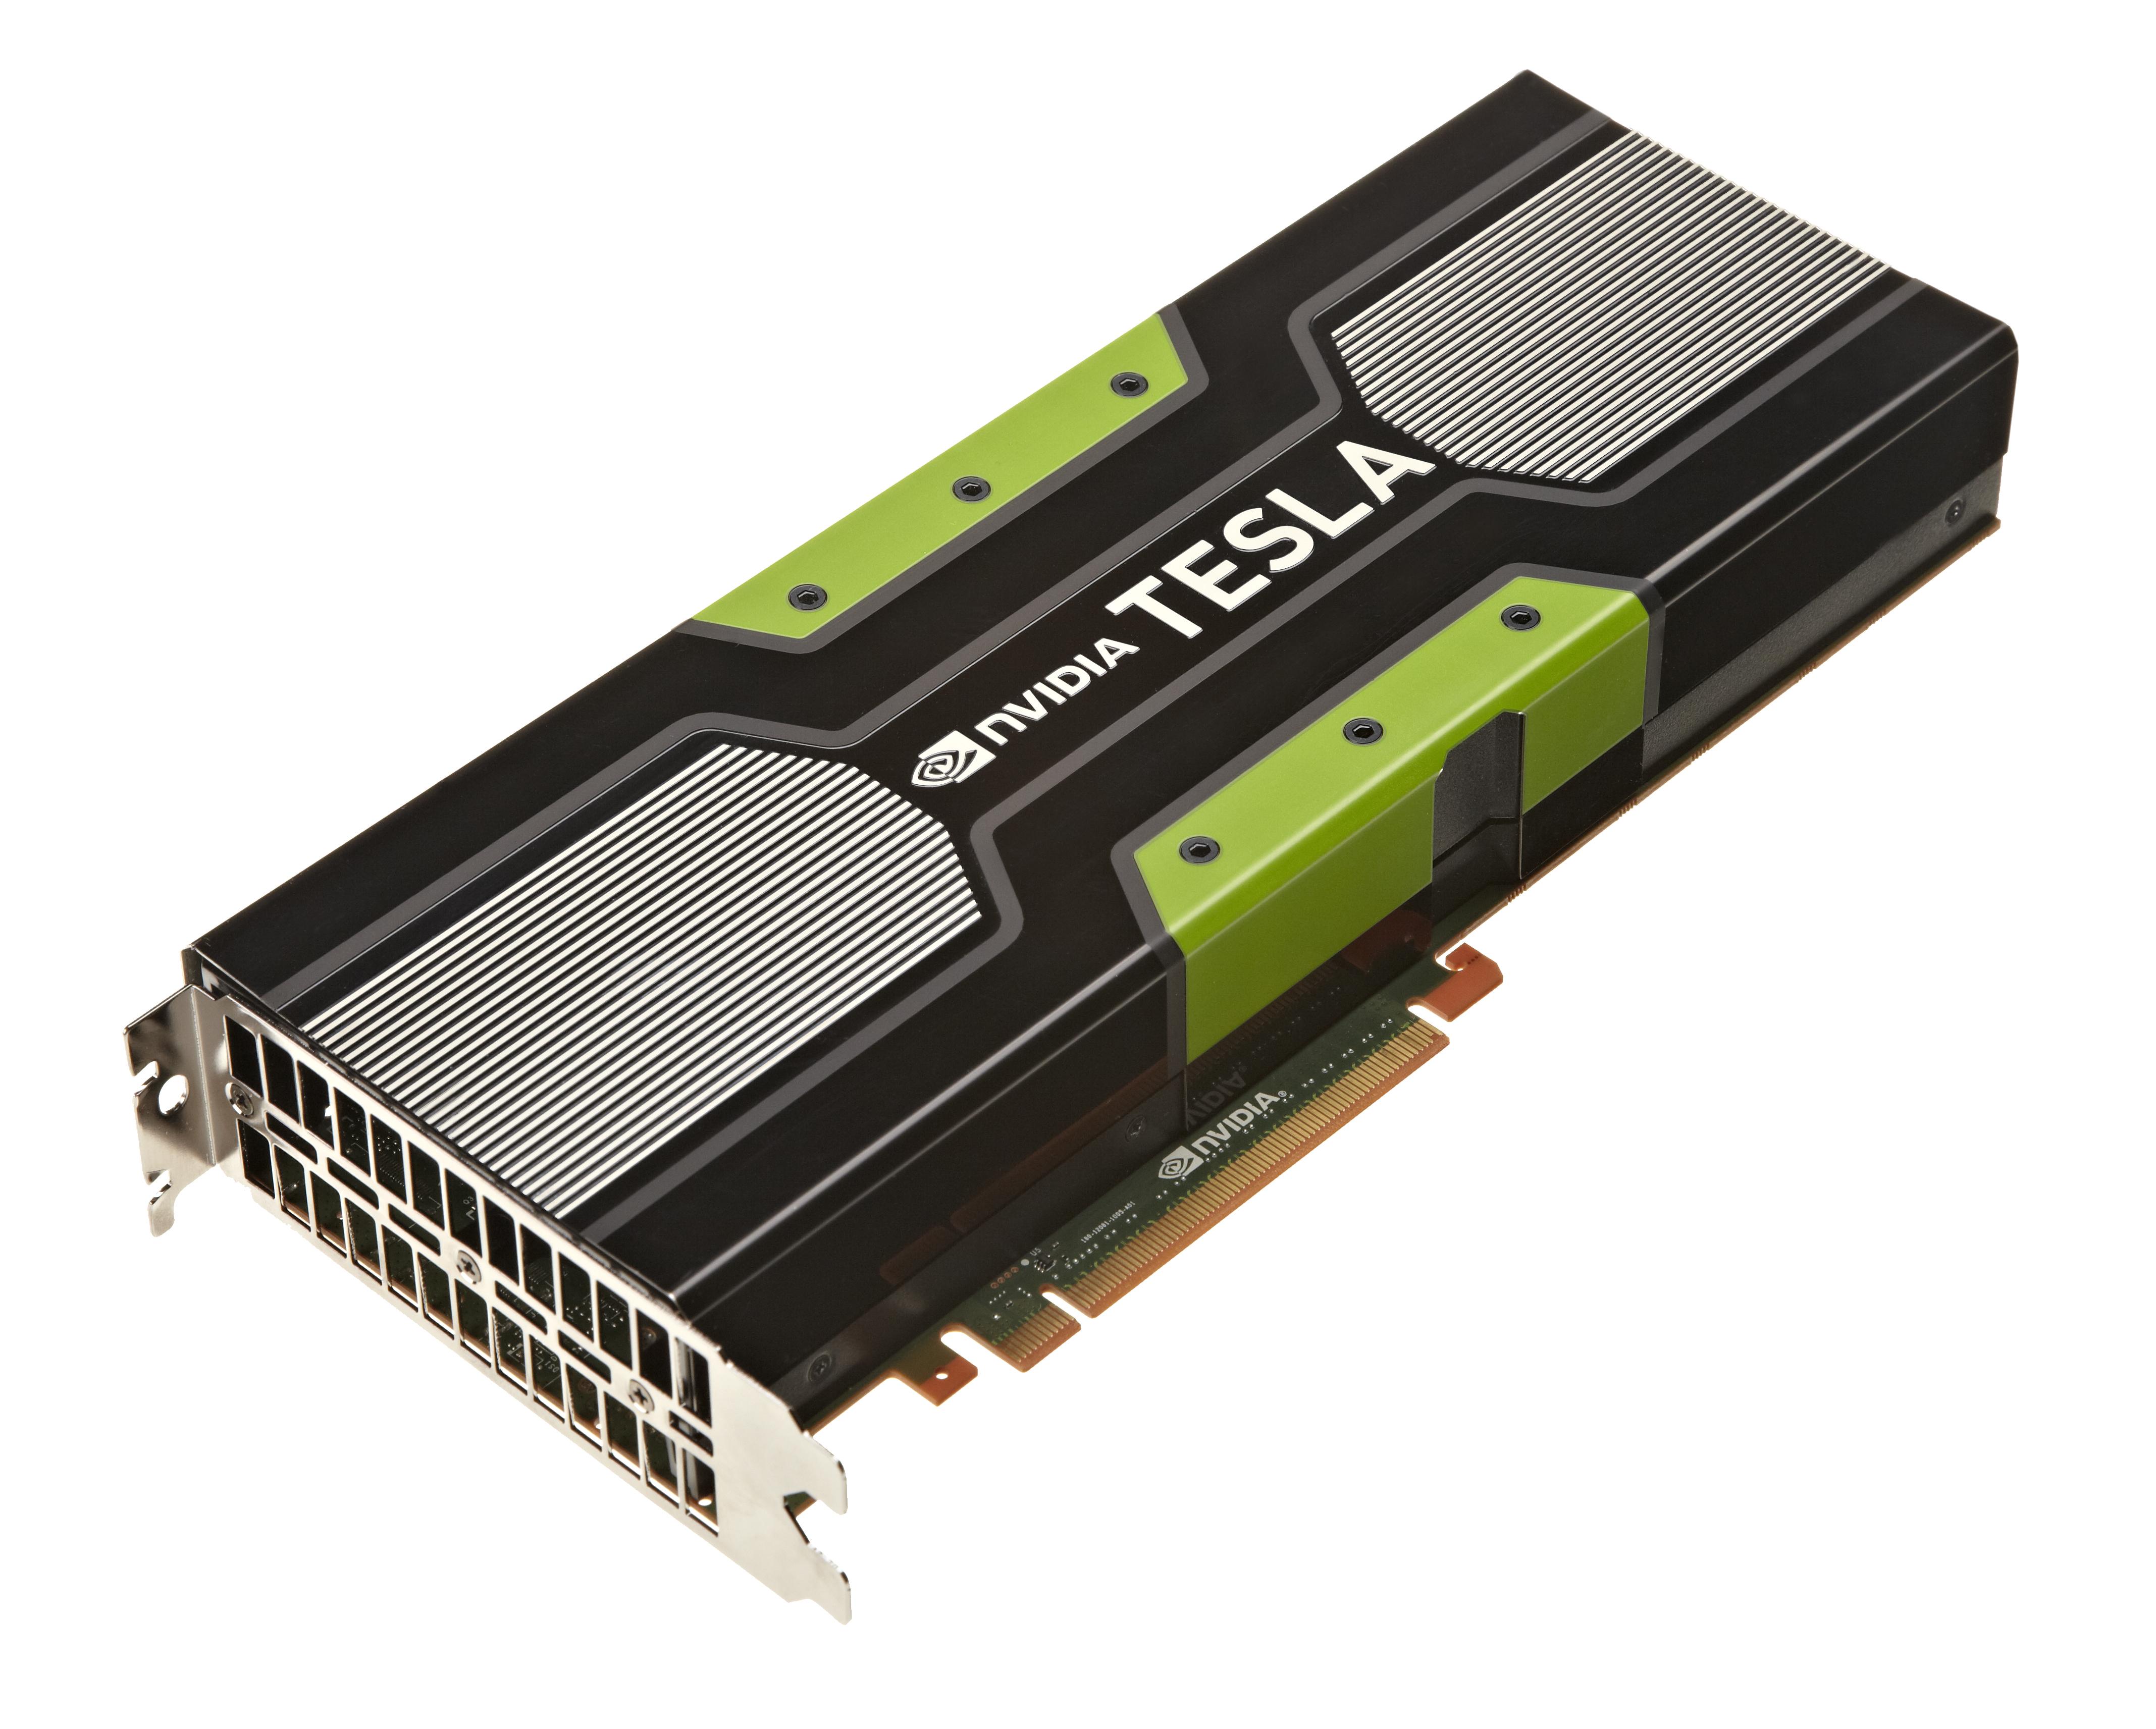 Media asset in full size related to 3dfxzone.it news item entitled as follows: NVIDIA: le GPU Tesla K20 per il supercomputer più veloce al mondo   Image Name: news18406_NVIDIA-Tesla-K20-GPU_1.jpg